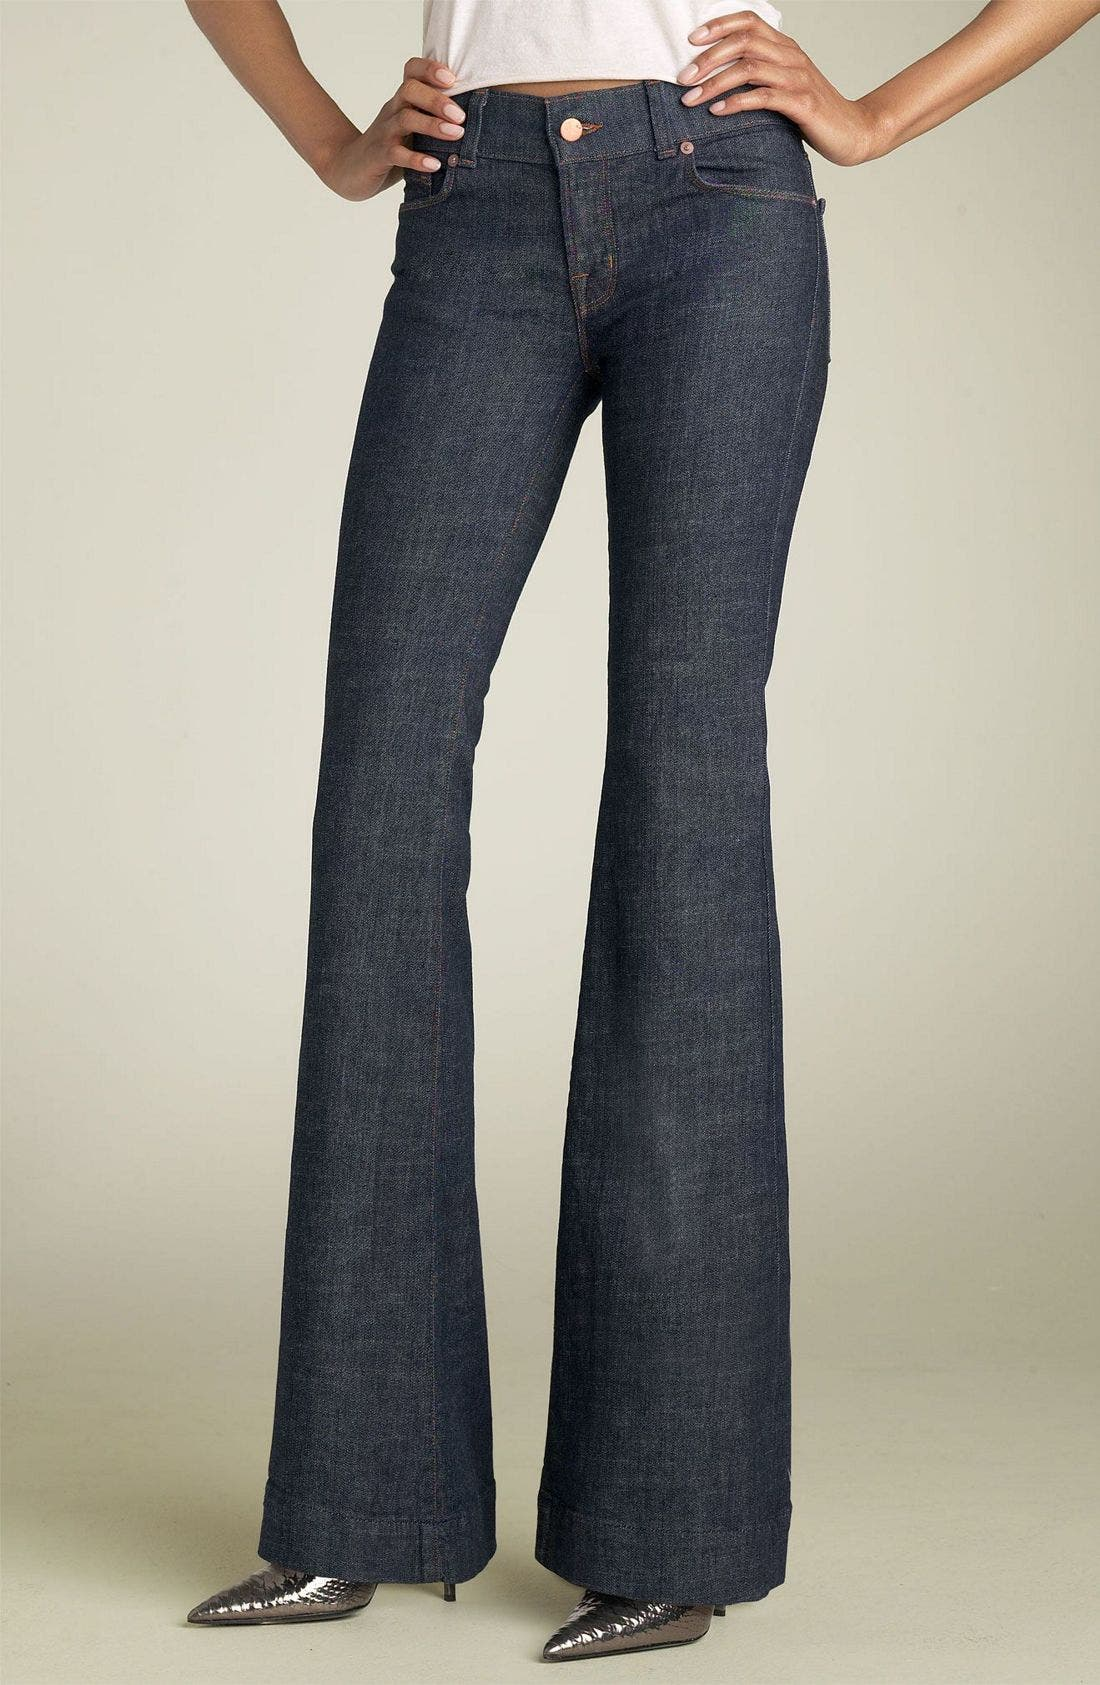 Alternate Image 2  - J Brand 'Lovestory' Low Rise Bell Bottom Stretch Jeans (Miner)